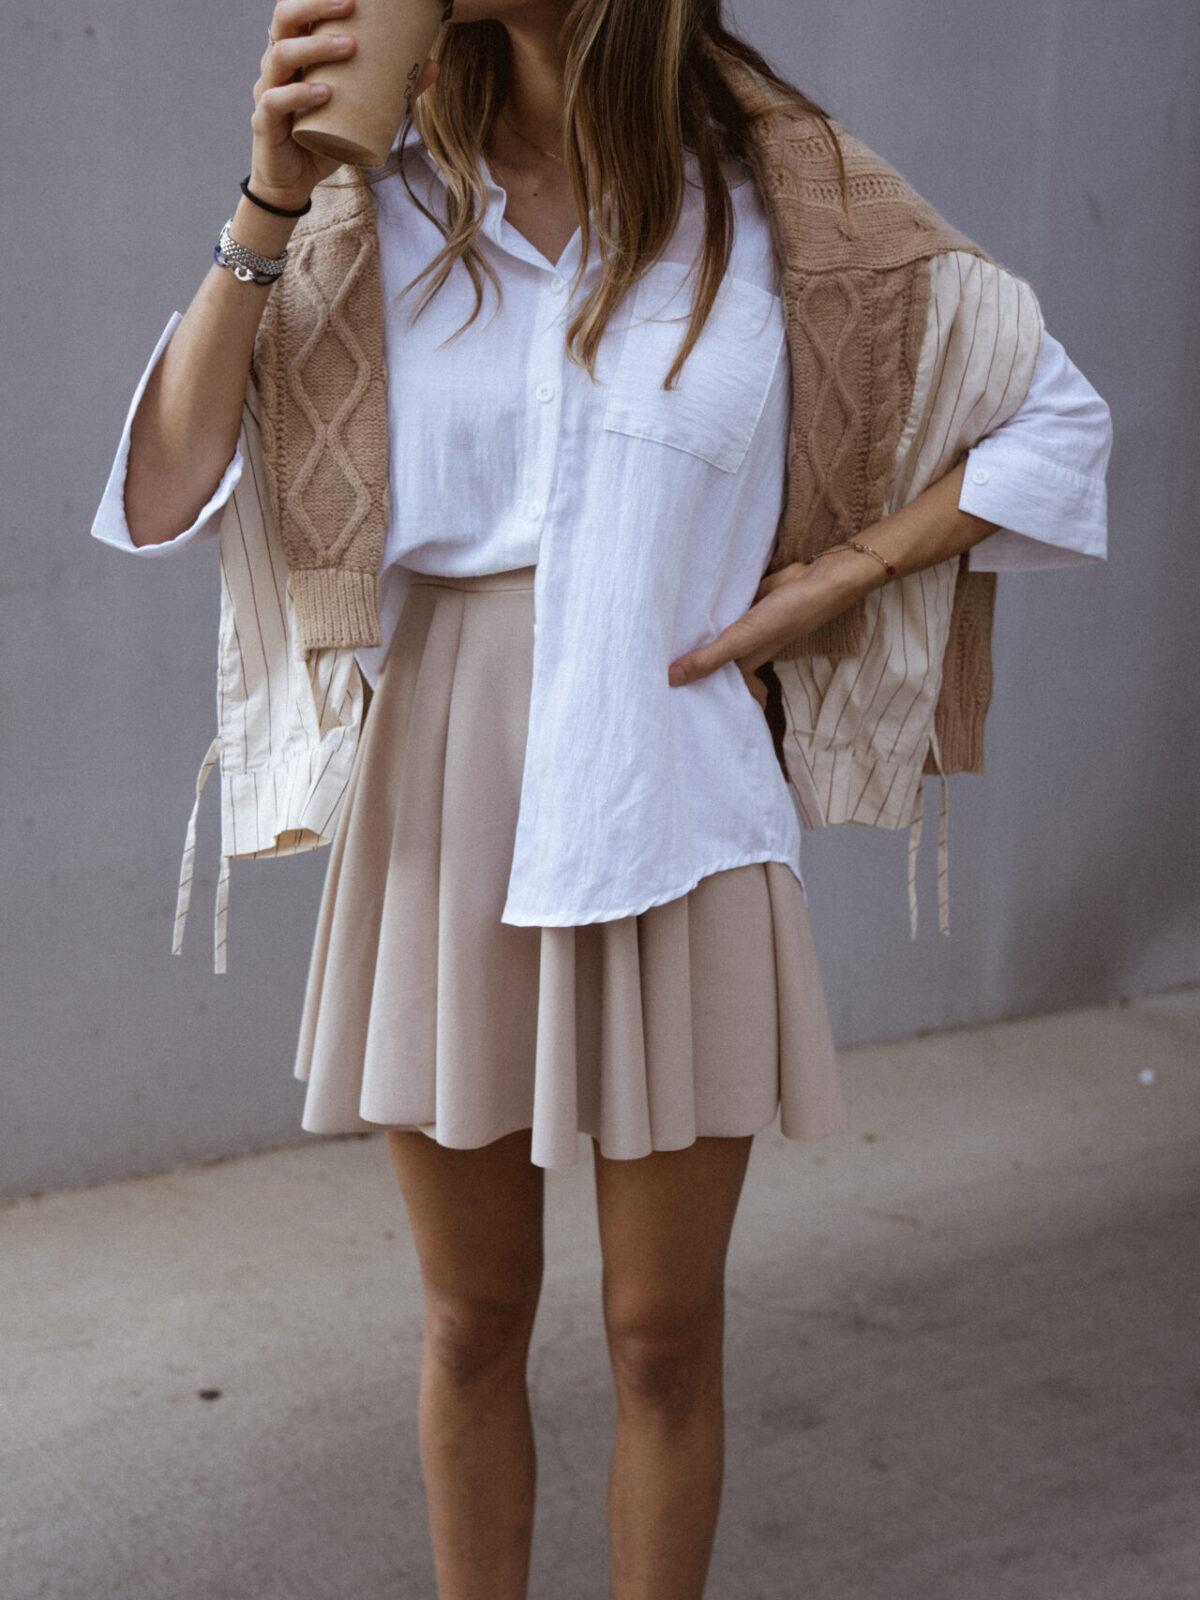 jupe-patineuse-beige-pull-beige-chemise-femme-gisette-store (32)